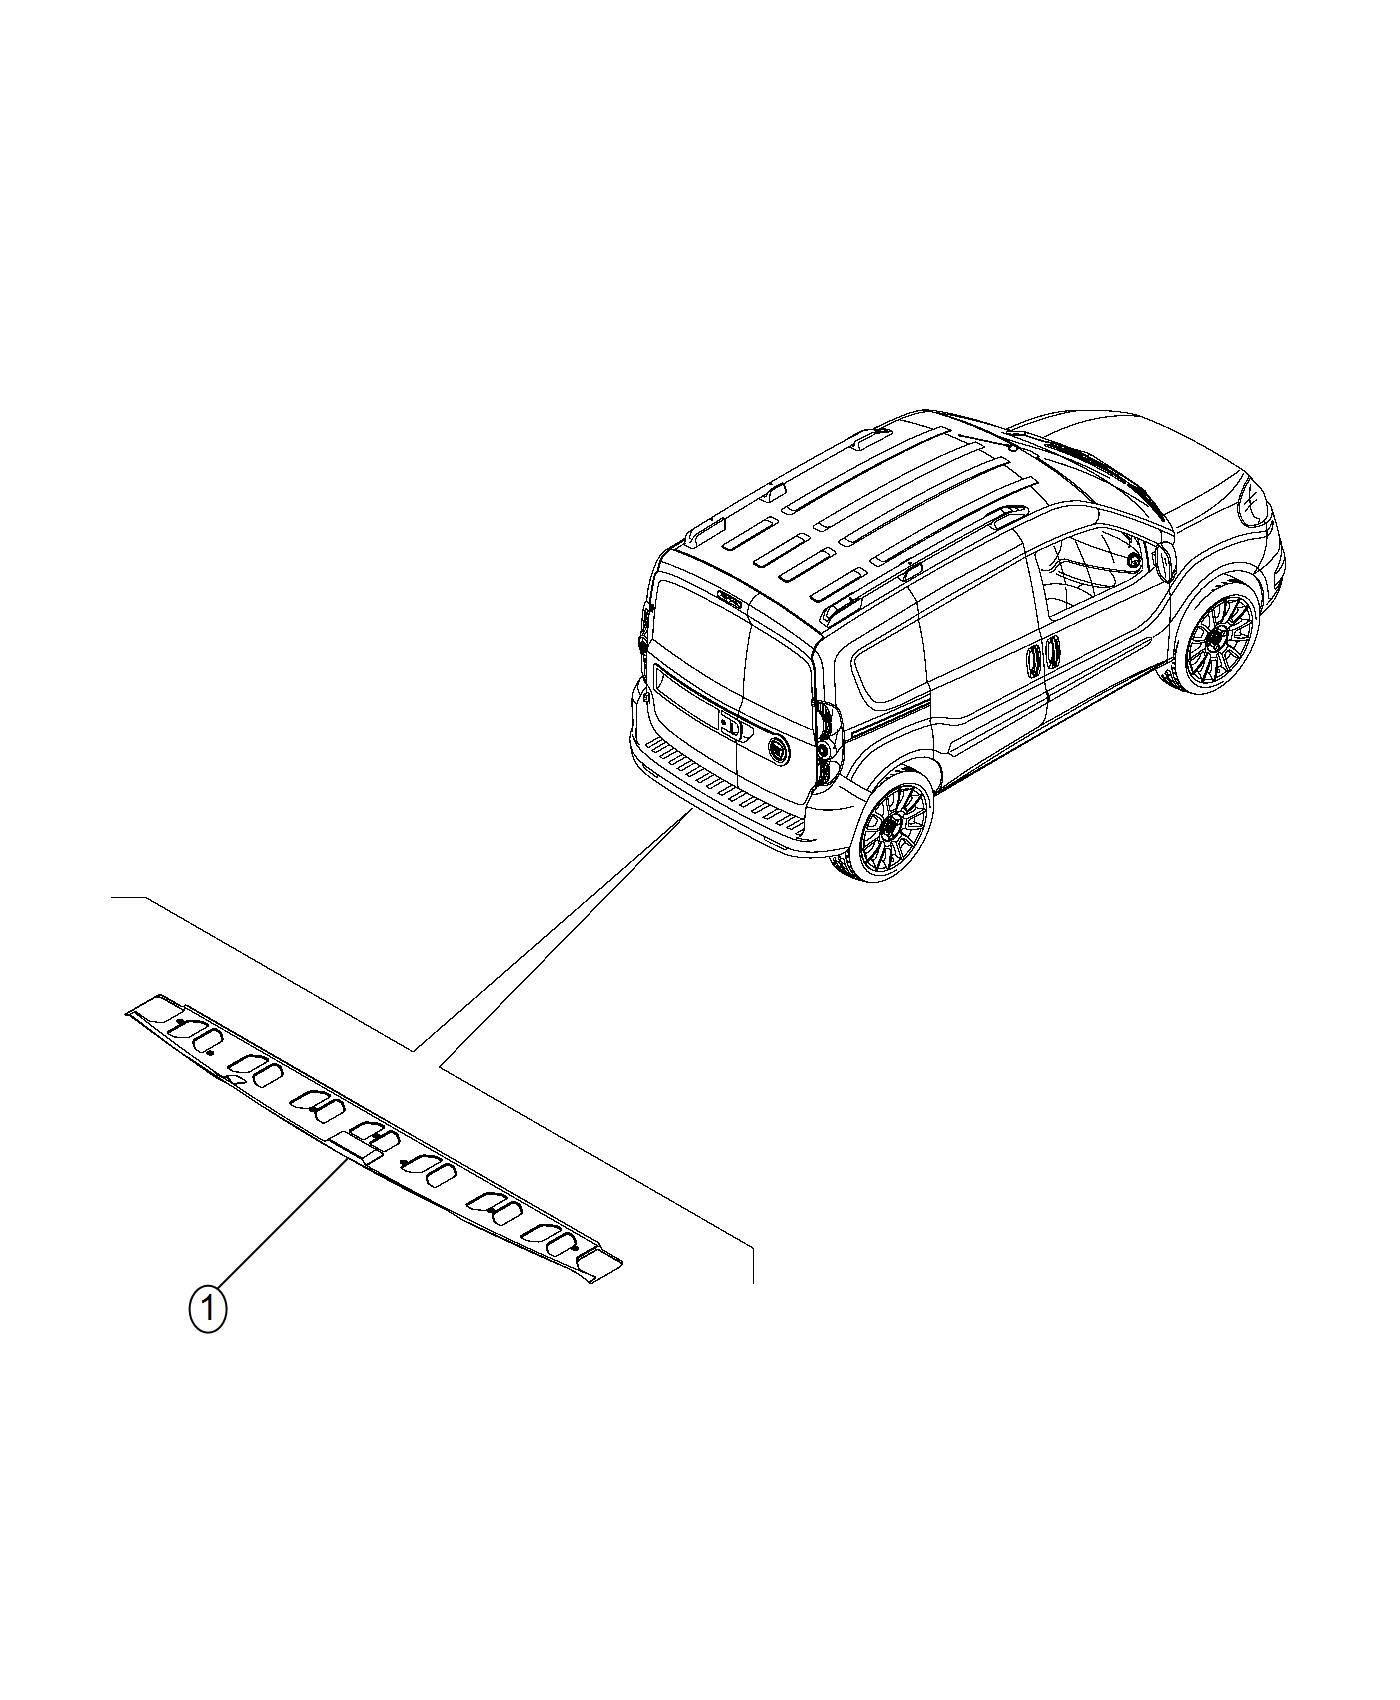 Ram Promaster City Wagon Slt Molding Cargo Door Trim No Description Available Color O0